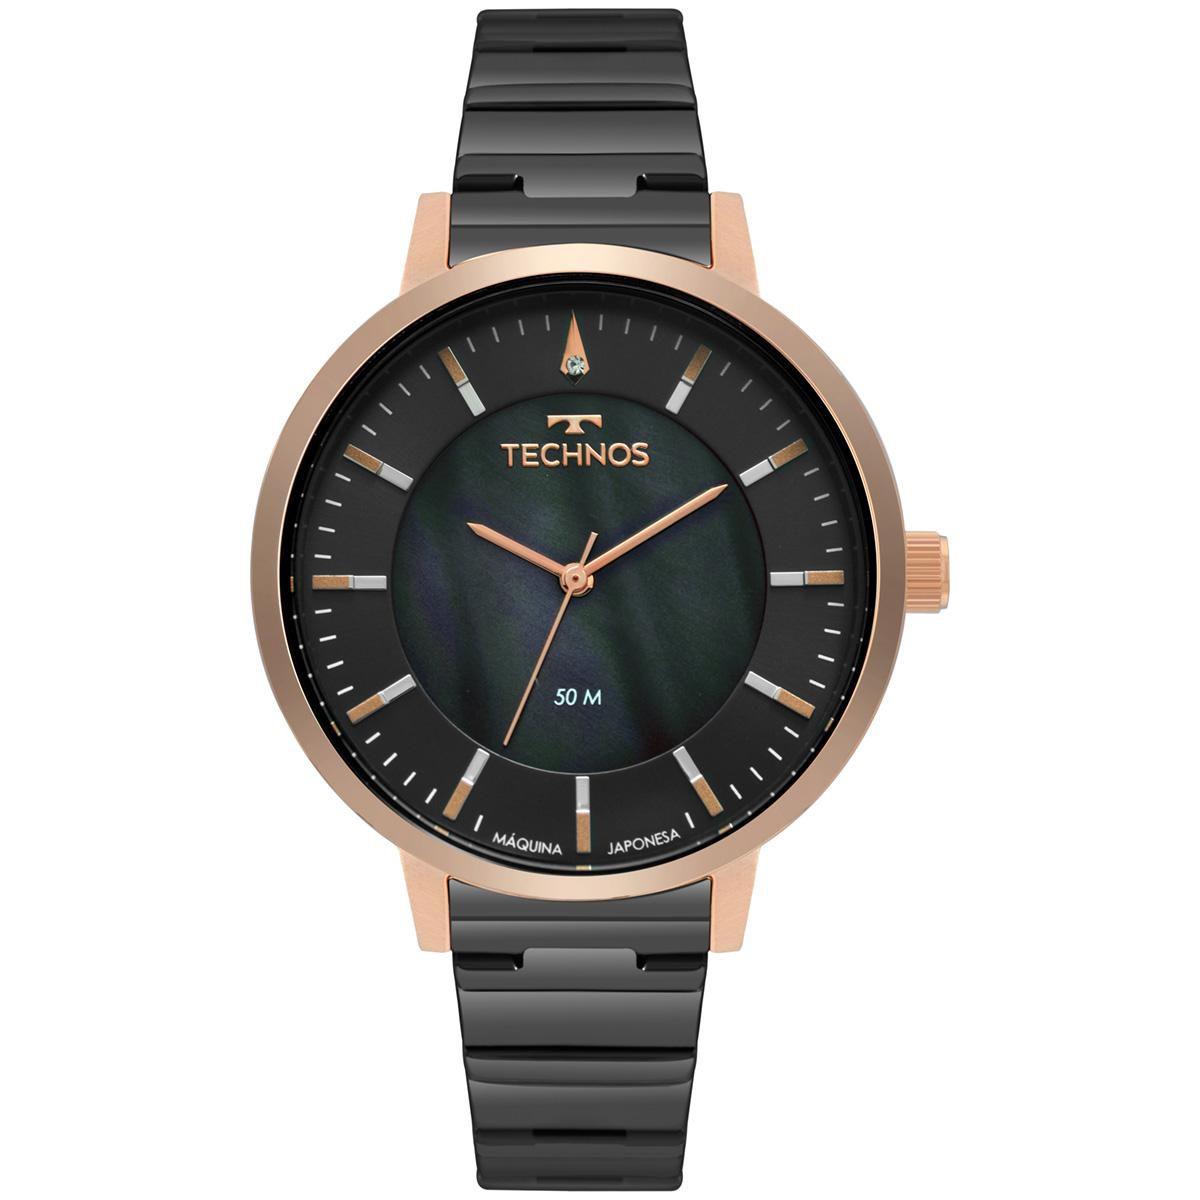 Relógio Feminno Technos Fashion Trend 2033CT/5C 40mm Aço Preto